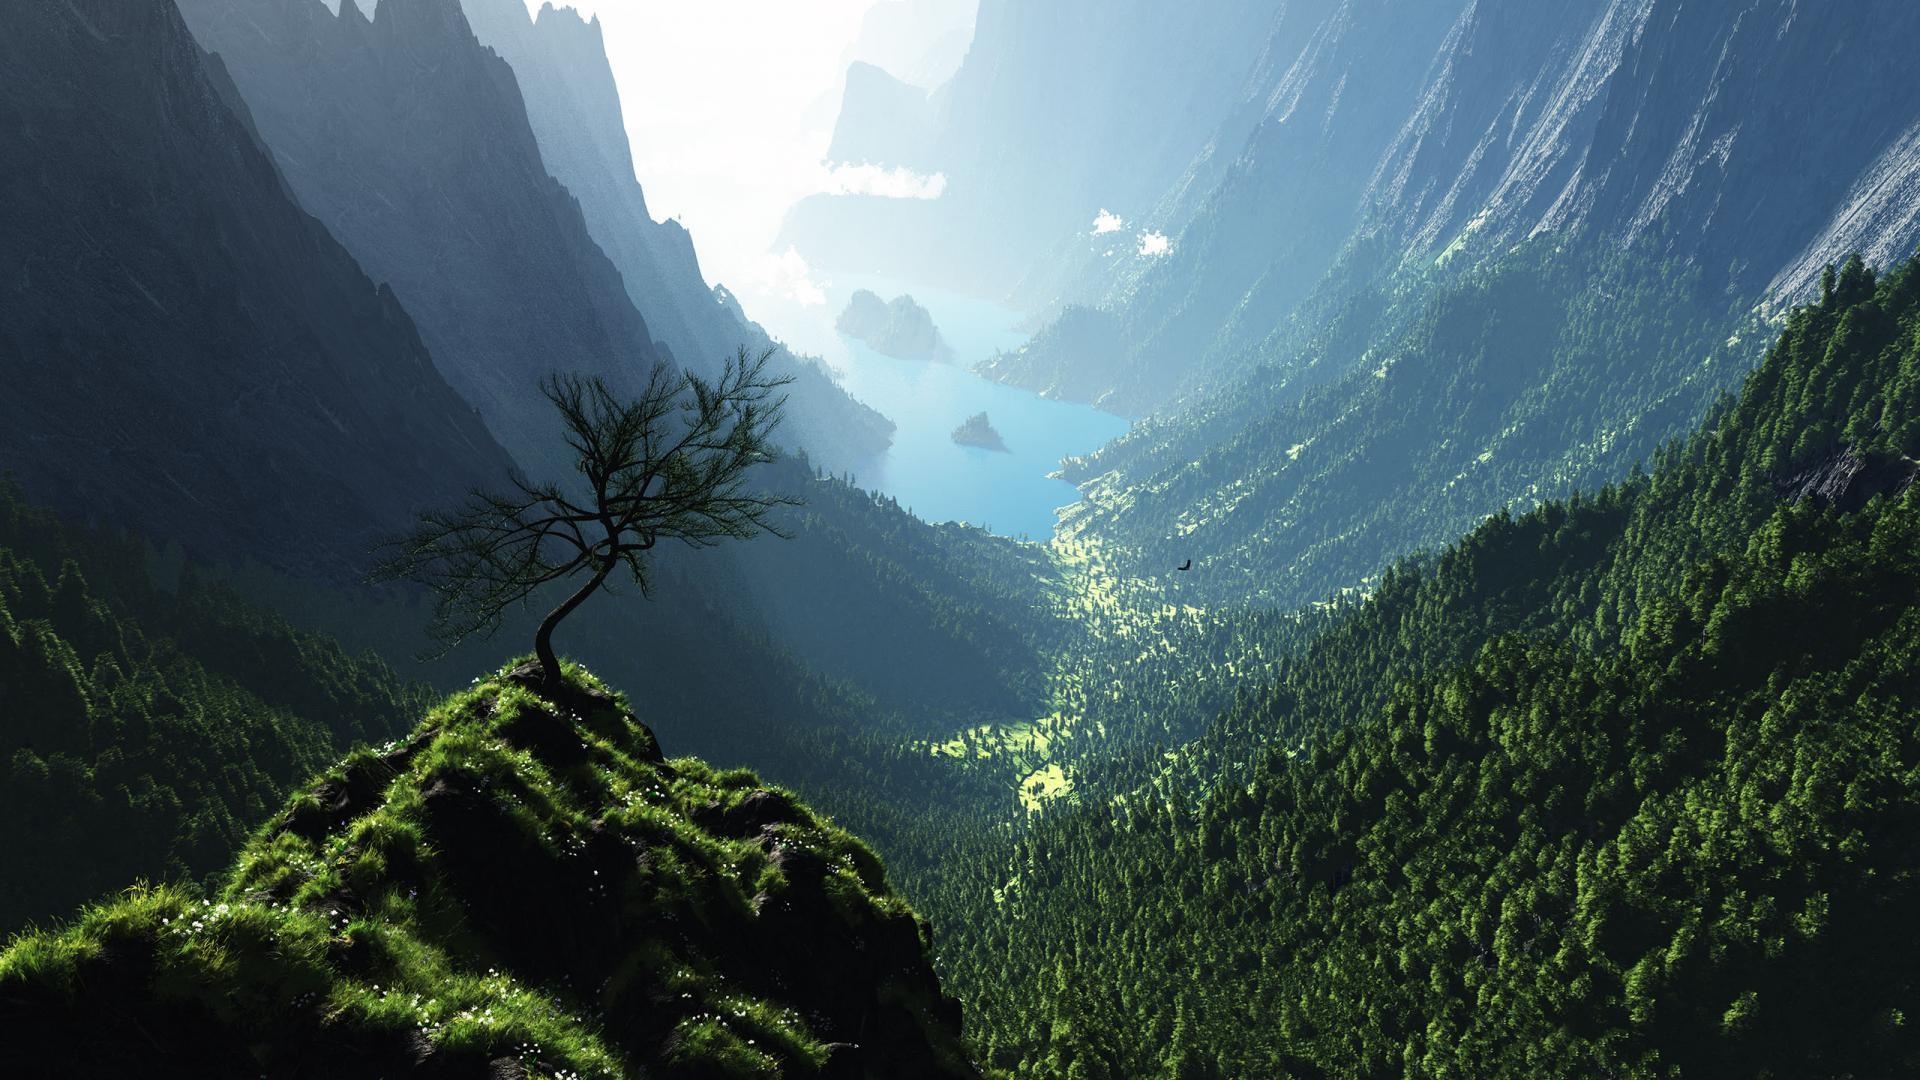 Earth – Mountain Tree Nature River Wallpaper